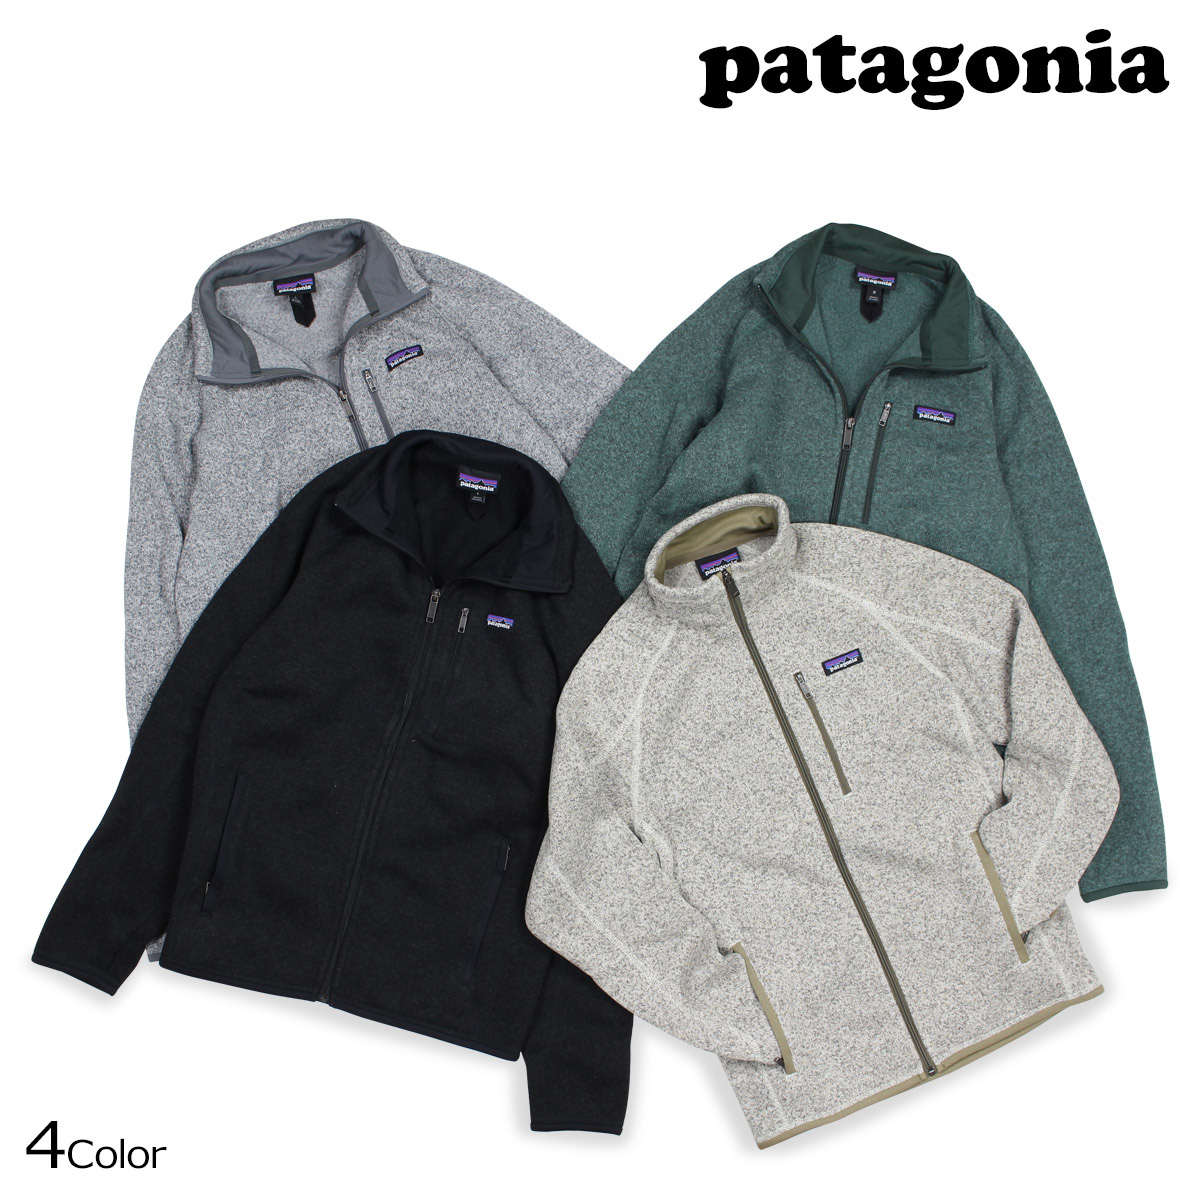 patagonia パタゴニア フリース ジャケット メンズ MENS BETTER SWEATER JACKET 25527 【決算セール 返品不可】